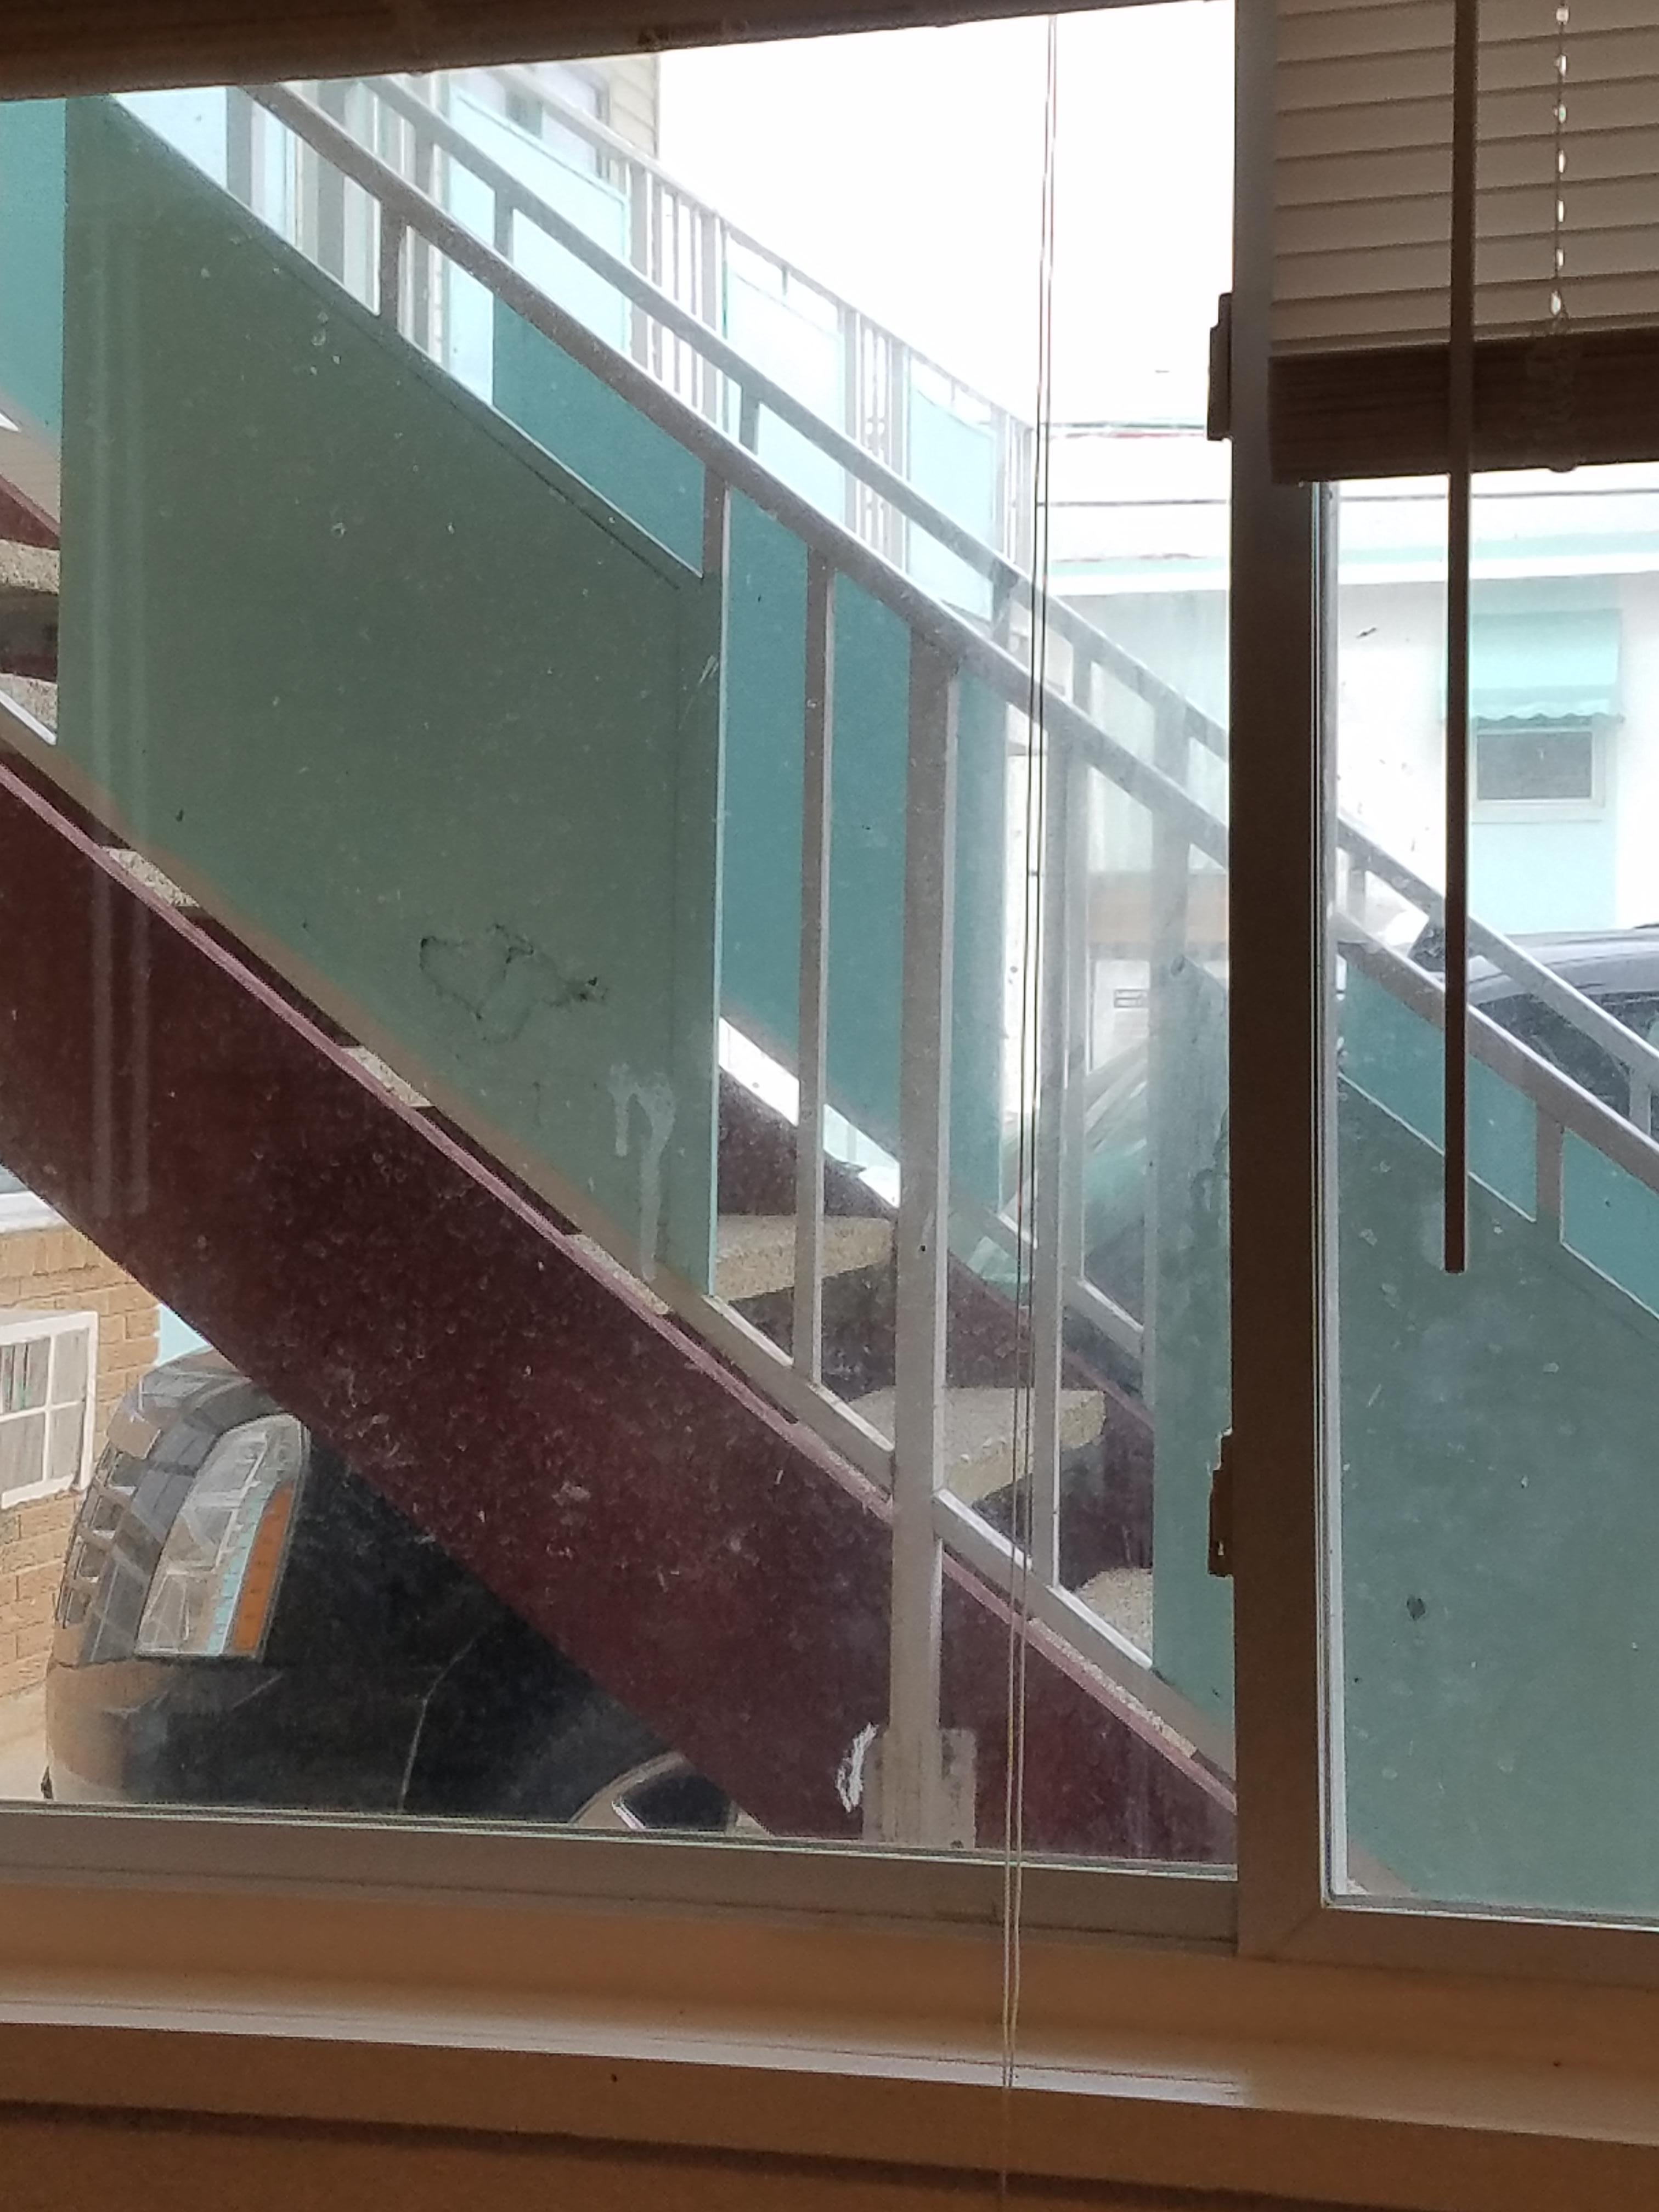 Dirty windows.